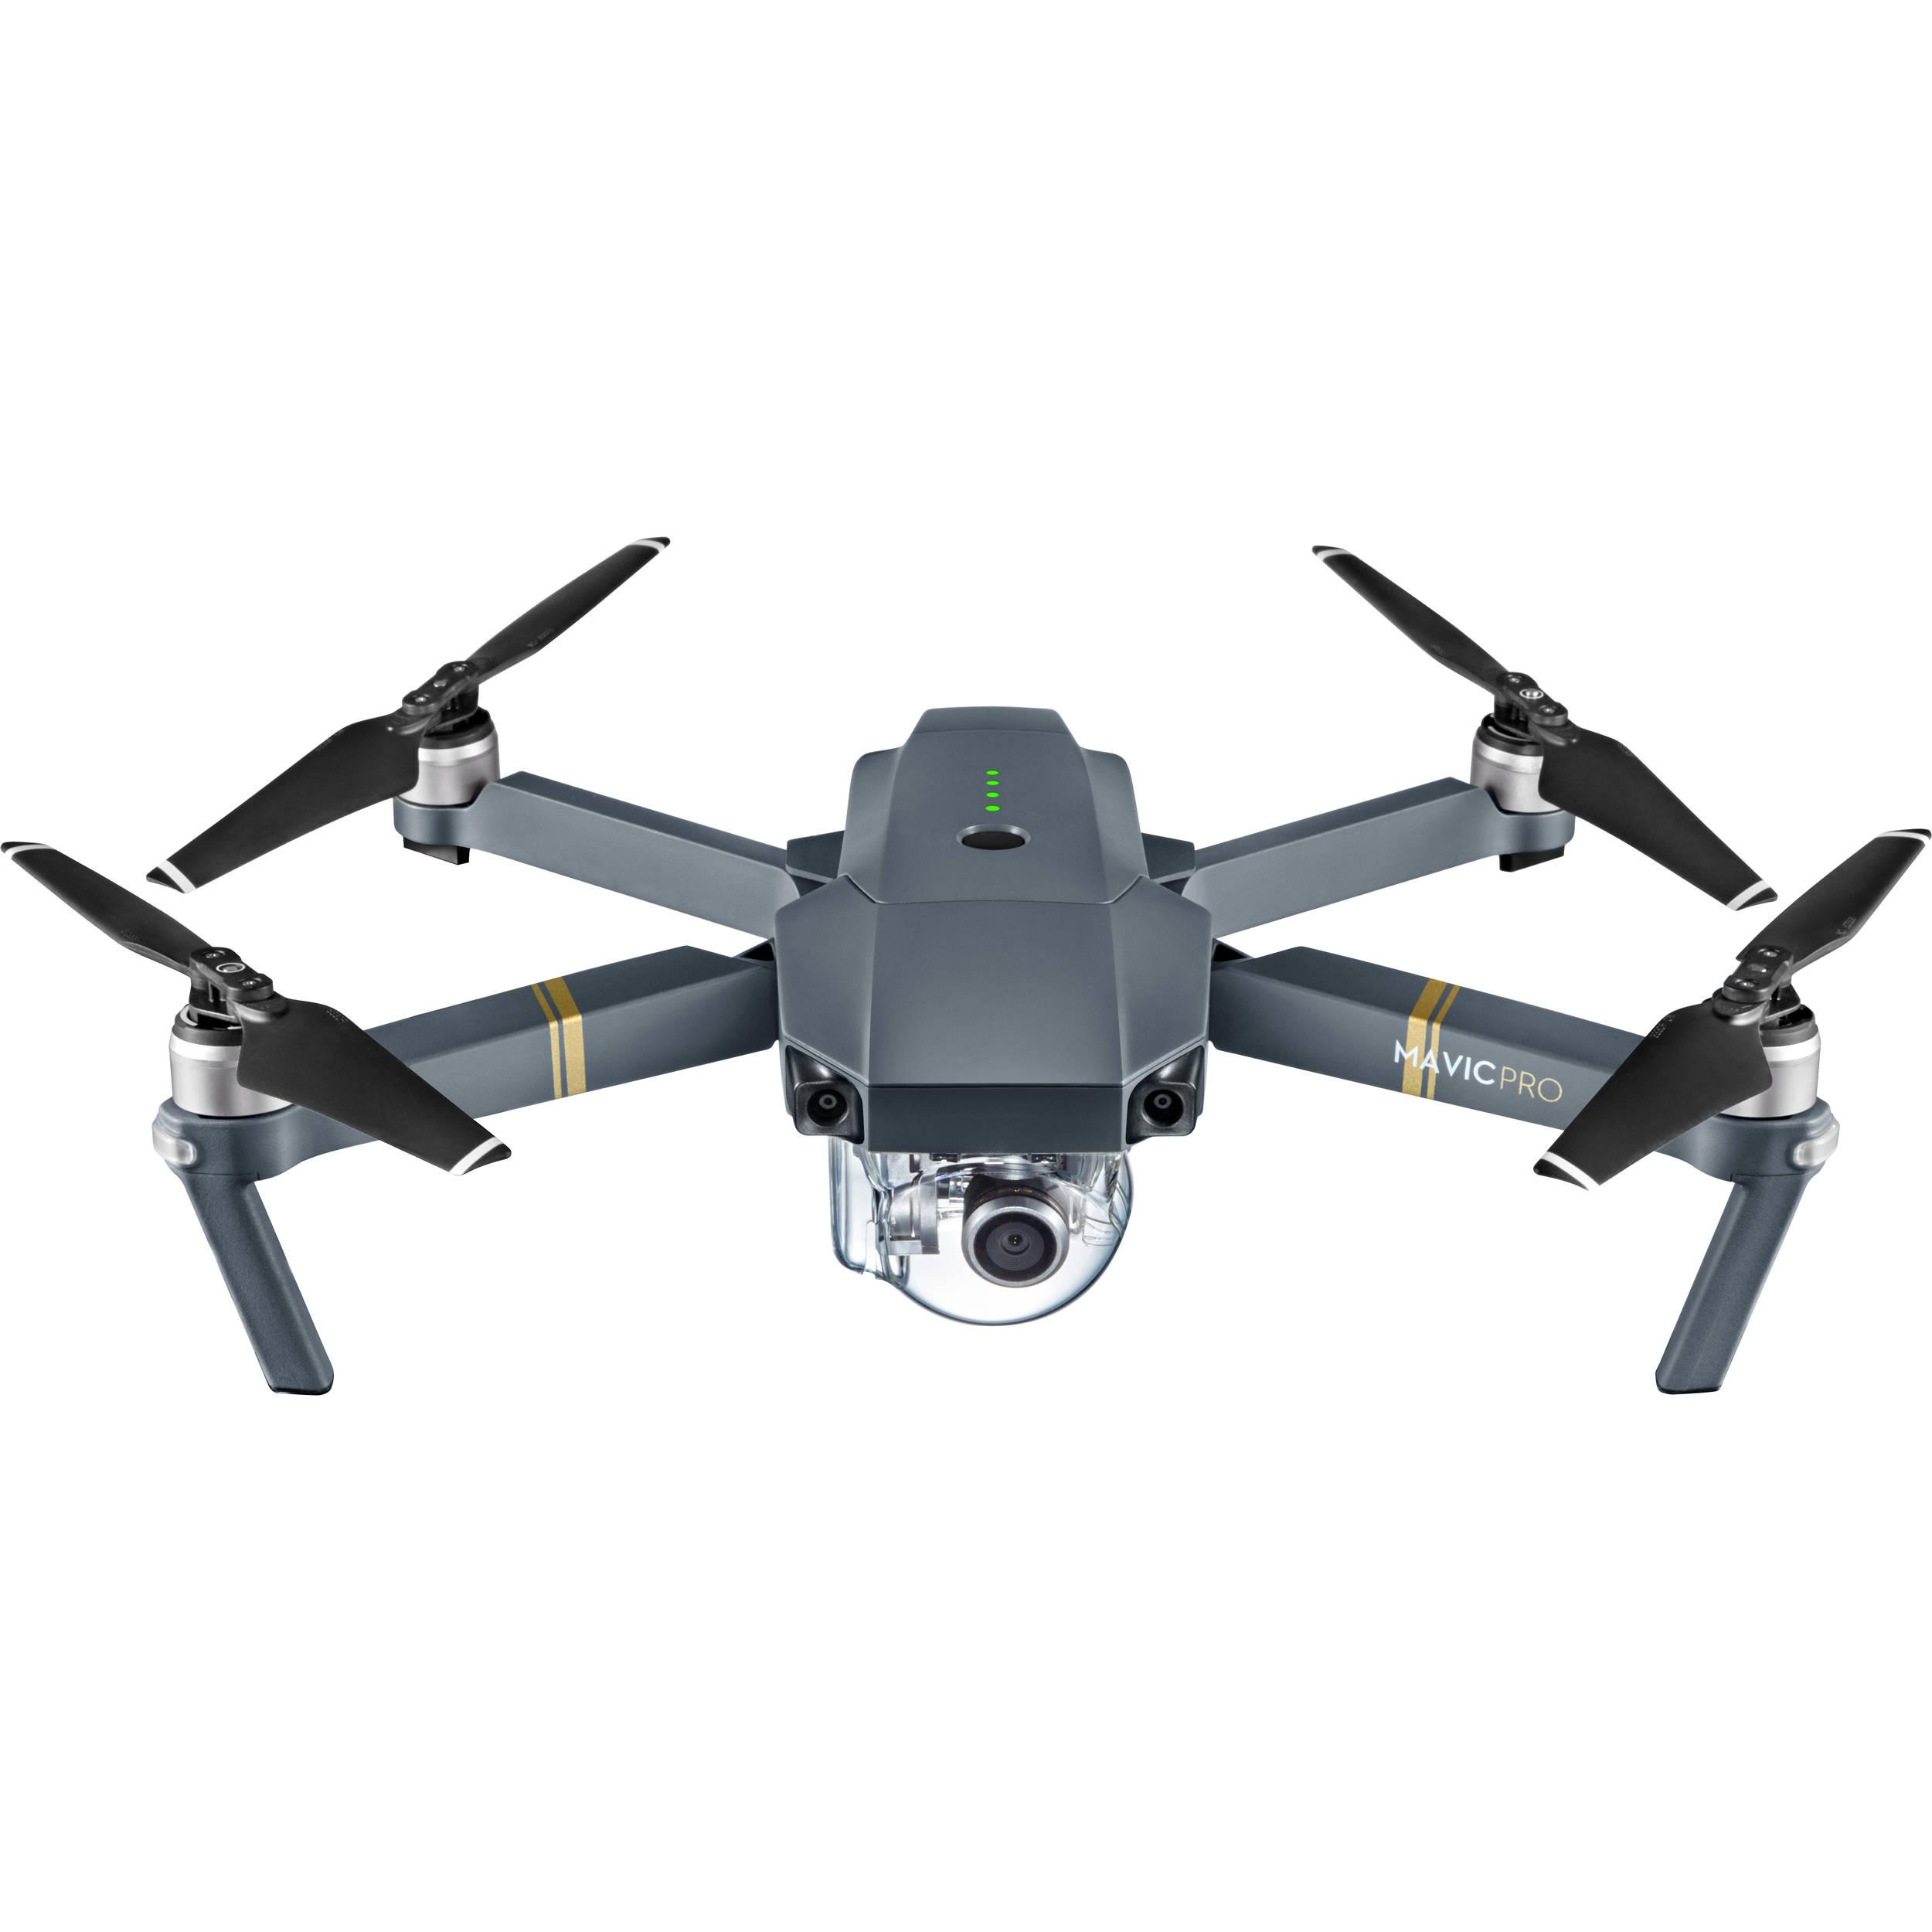 DJI Mavic Pro RC Quadcopter za $849.11 (11.11.2017) @ Gearbest